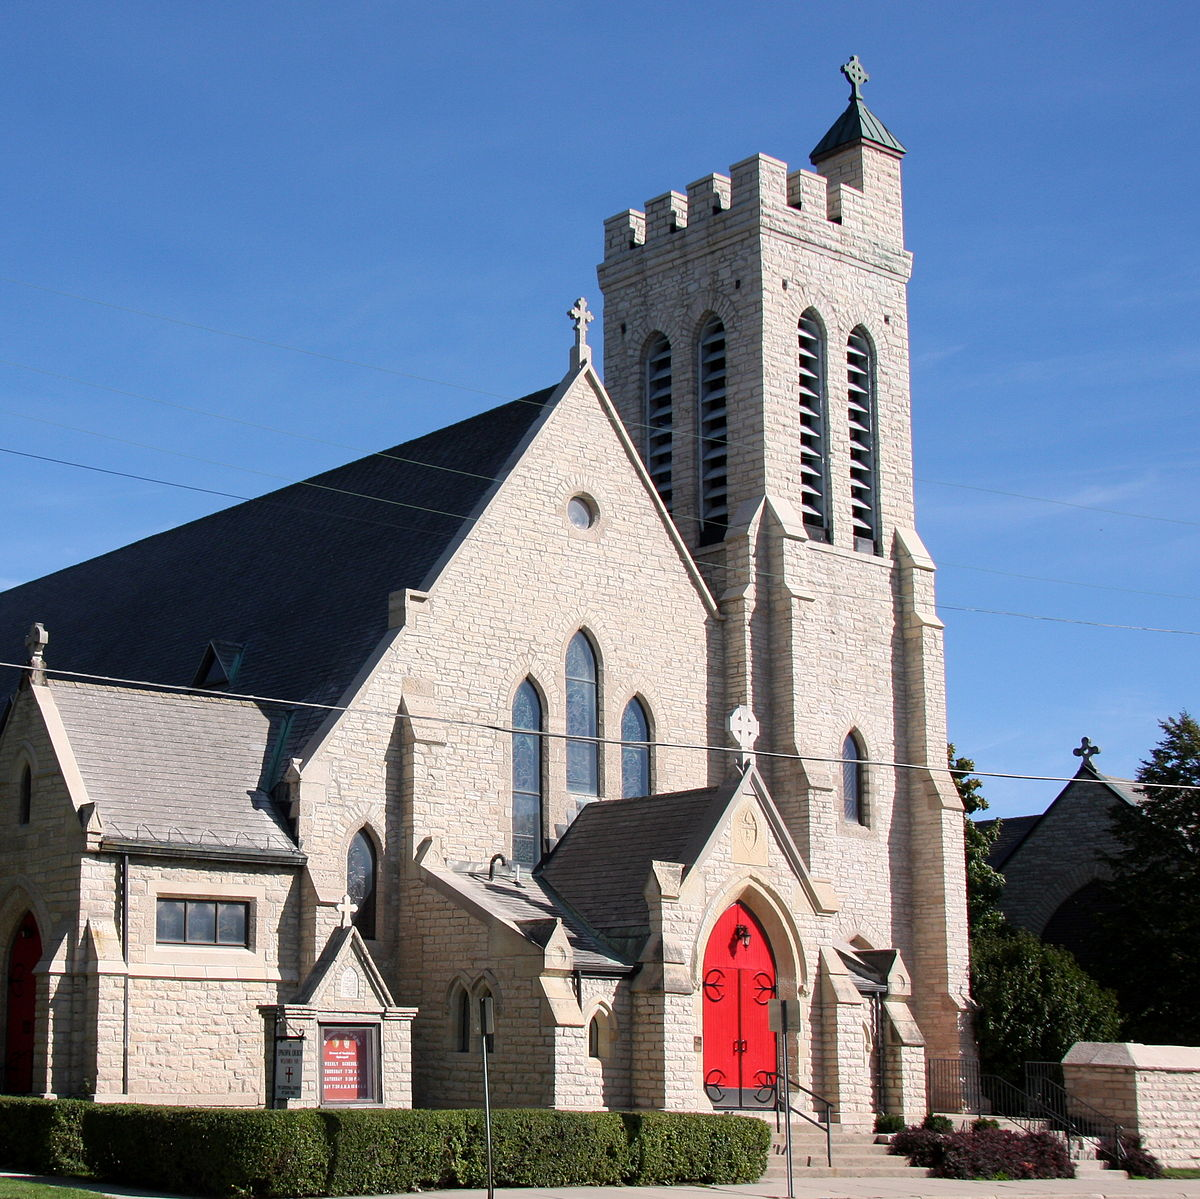 Fond Du Lac Wi >> St. Paul's Cathedral (Fond du Lac, Wisconsin) - Wikipedia